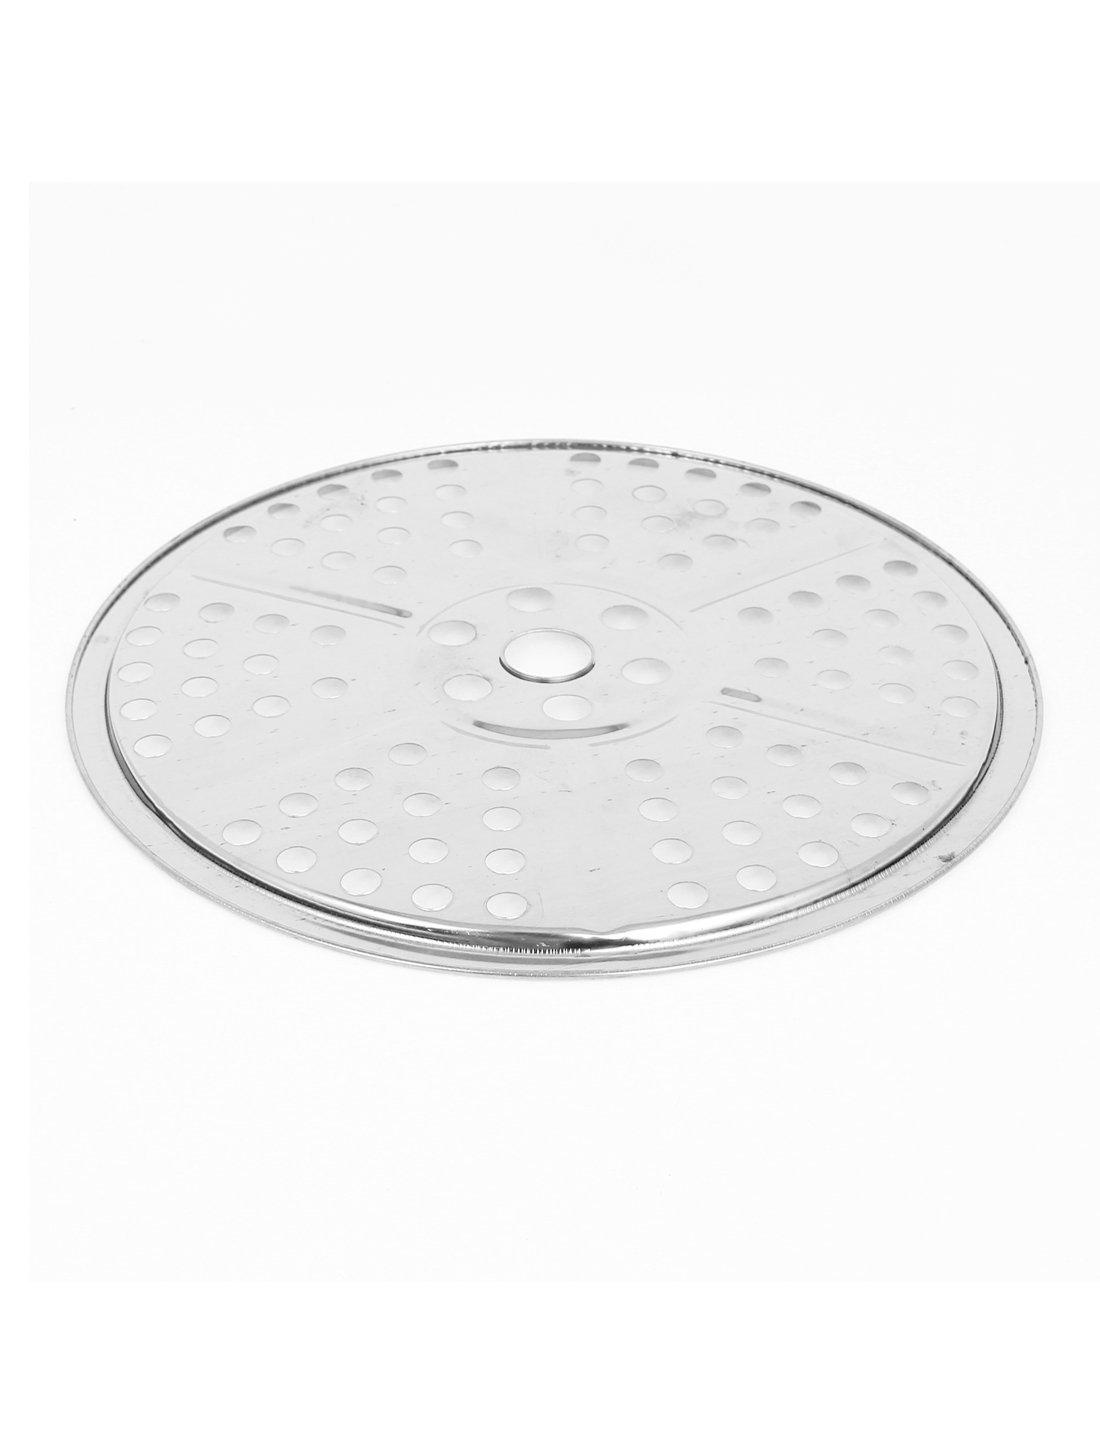 Amazon.com: Cocina de acero inoxidable que cocina al vapor rack 8.7 pulgadas 2pcs: Kitchen & Dining